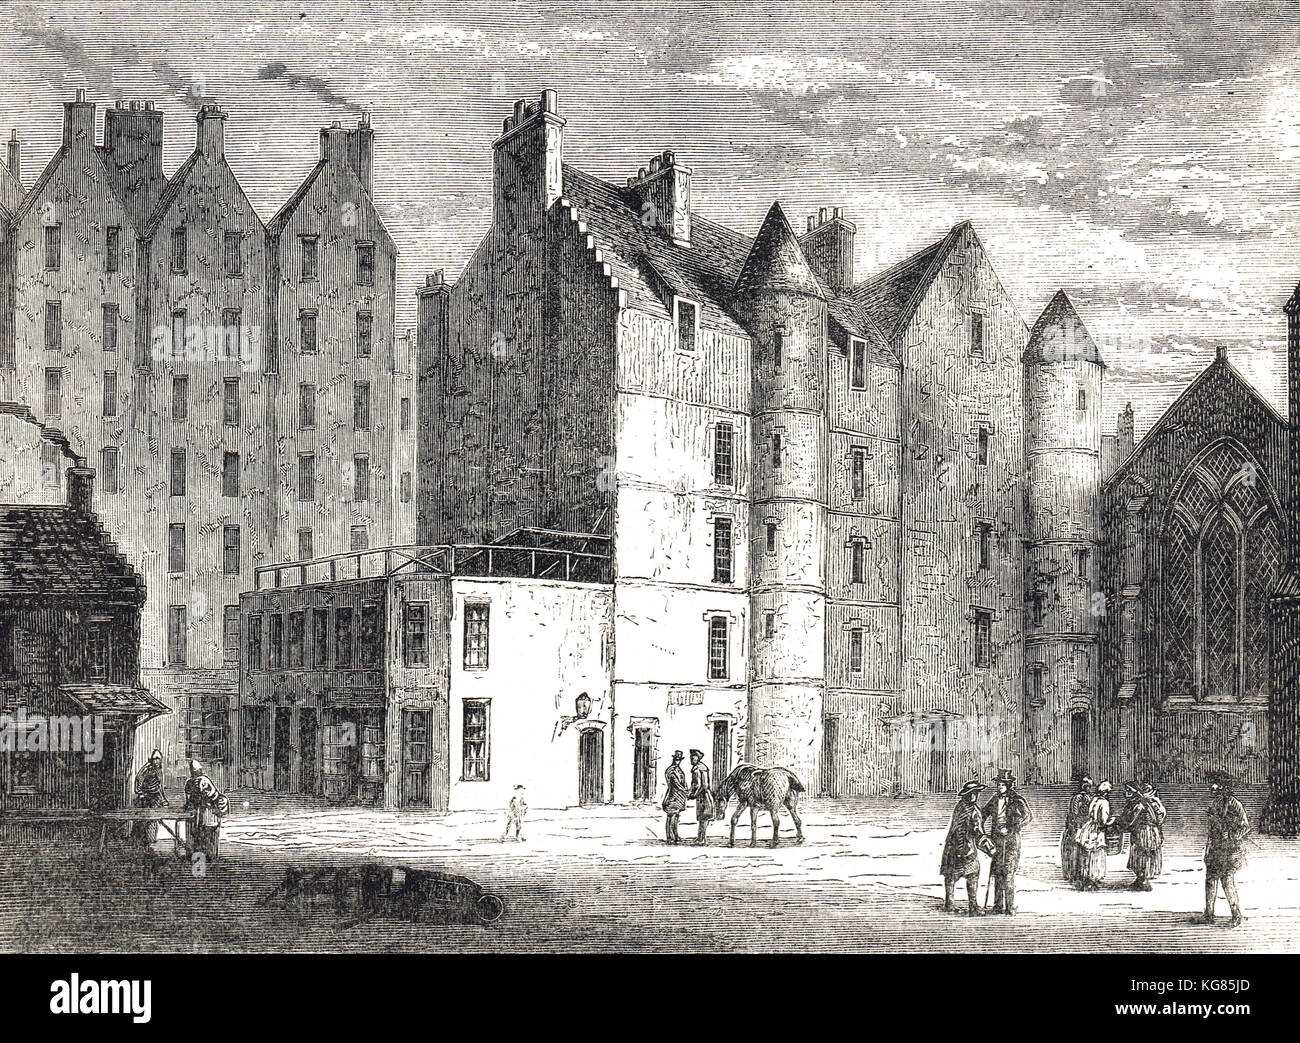 19th century engraving, Old Tolbooth, Edinburgh, Scotland - Stock Image